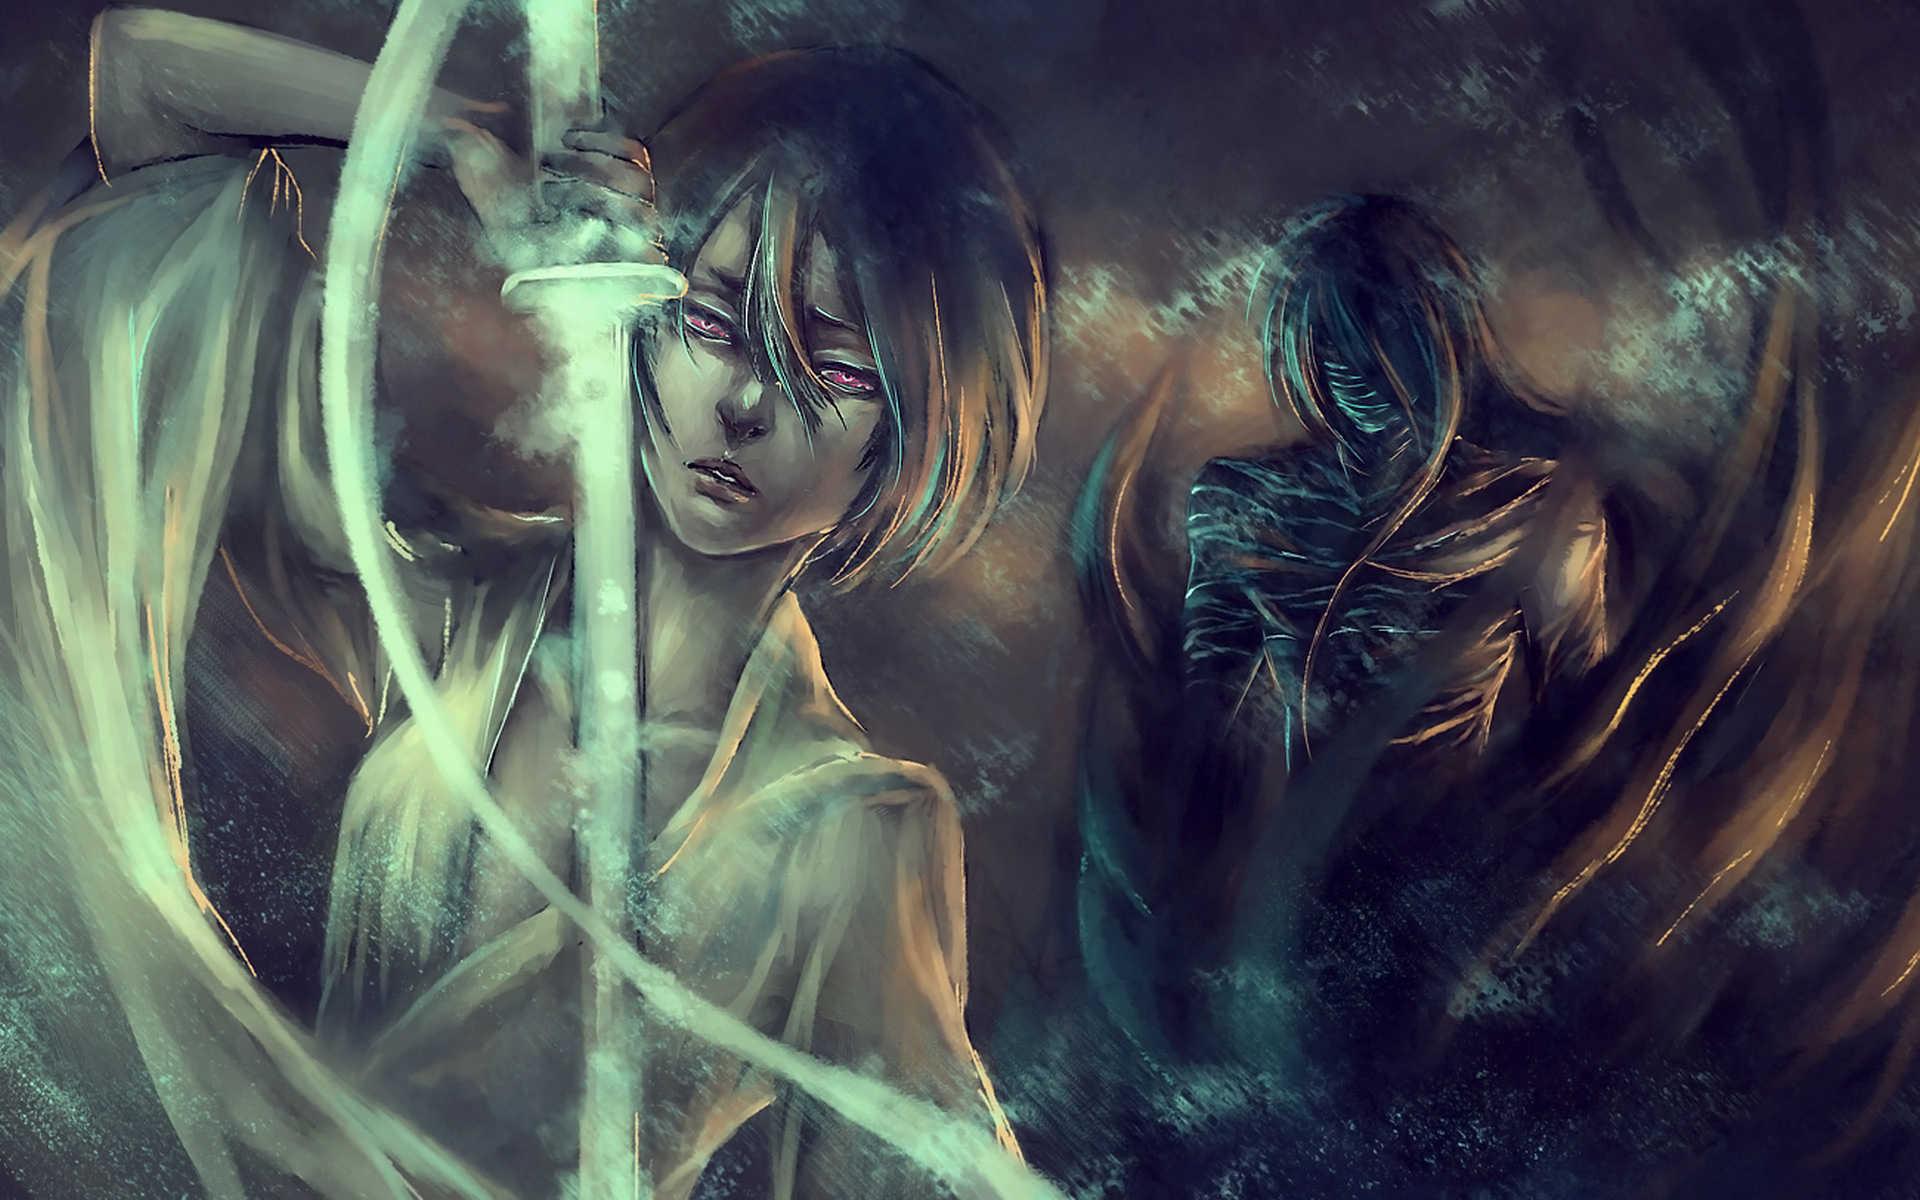 Bleach Manga Image Wallpaper